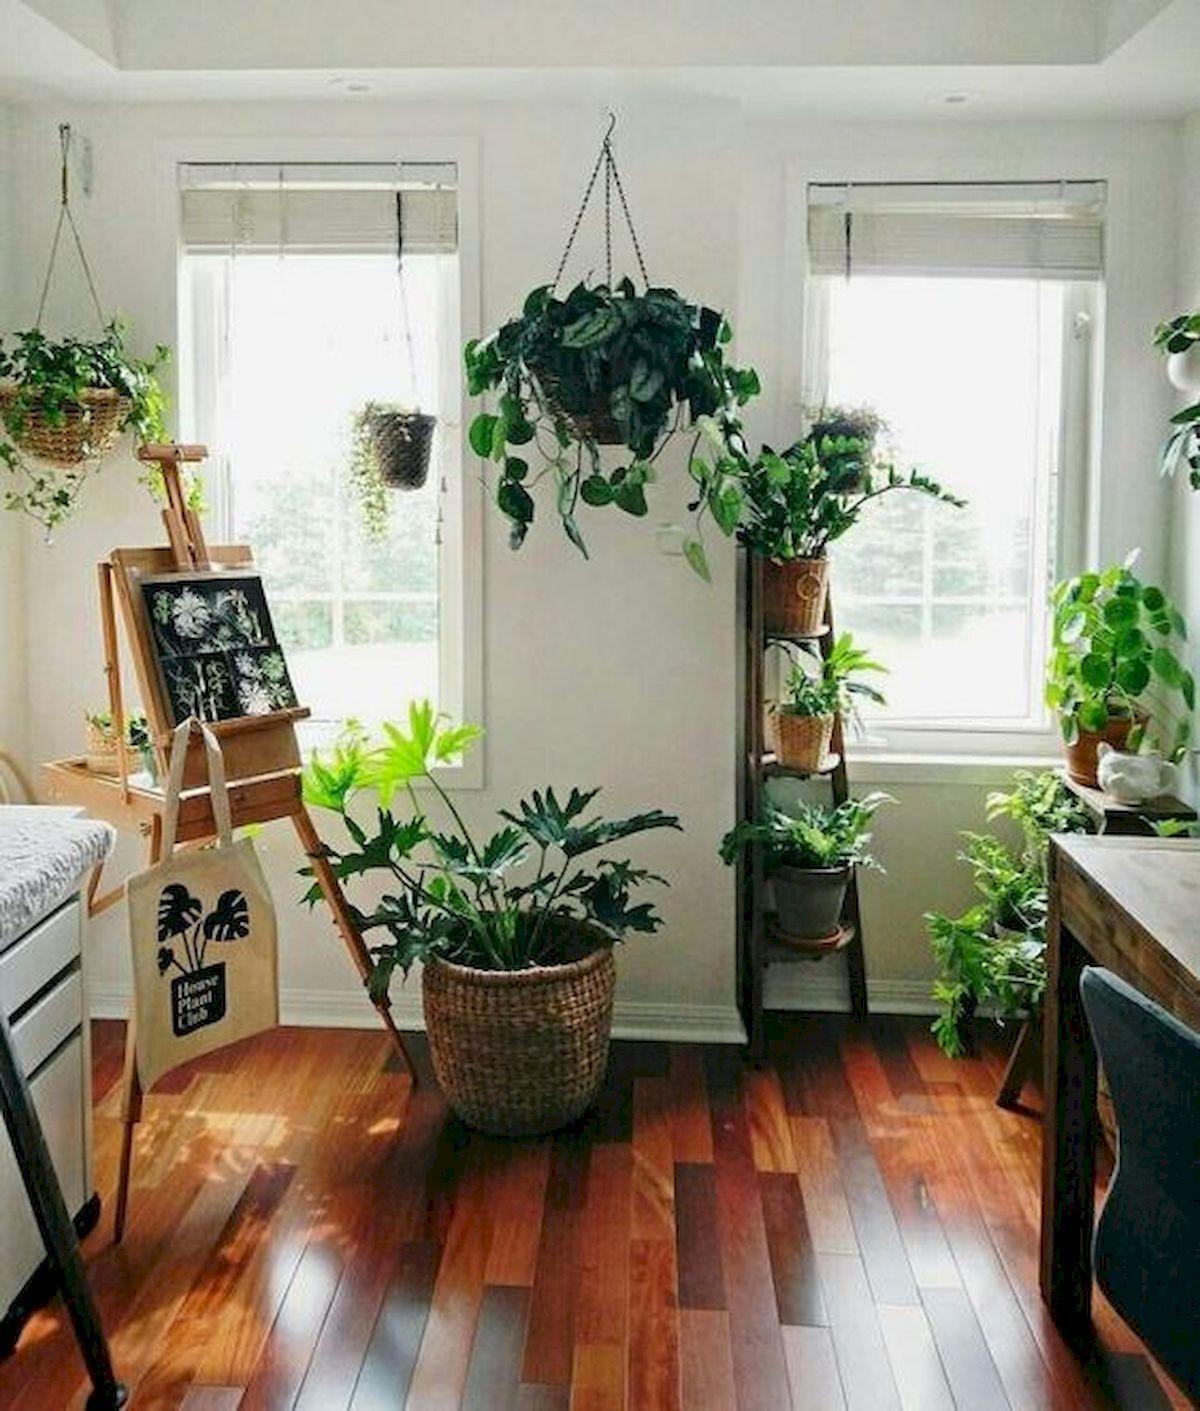 Cool 40 Amazing Indoor Garden Design Ideas That Make Your